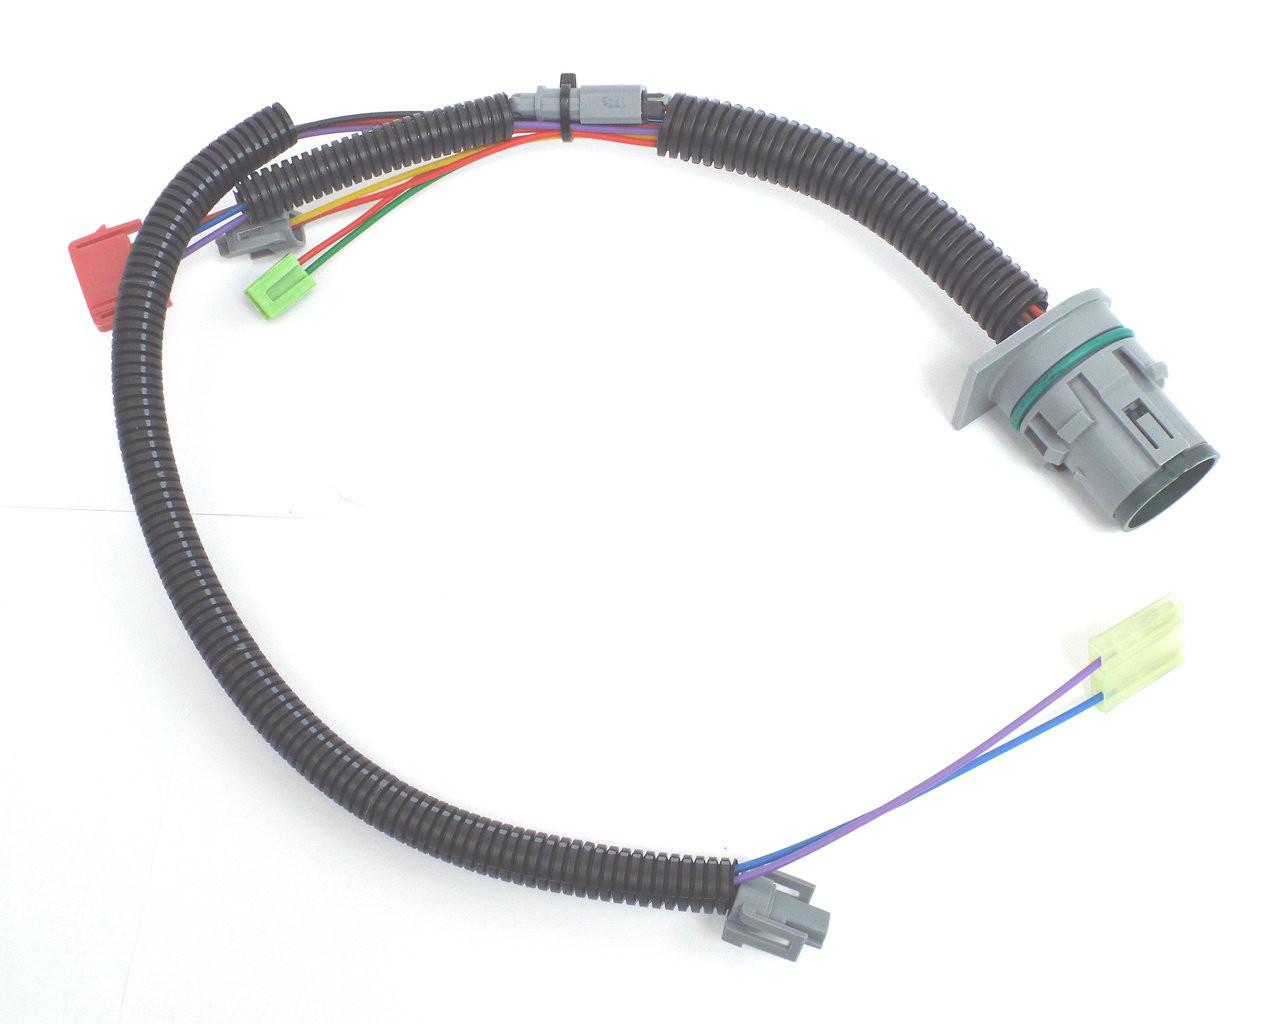 new 4l80e transmission hd internal valve body wiring harness 1991 2003 4l80e wiring harness [ 1280 x 1024 Pixel ]